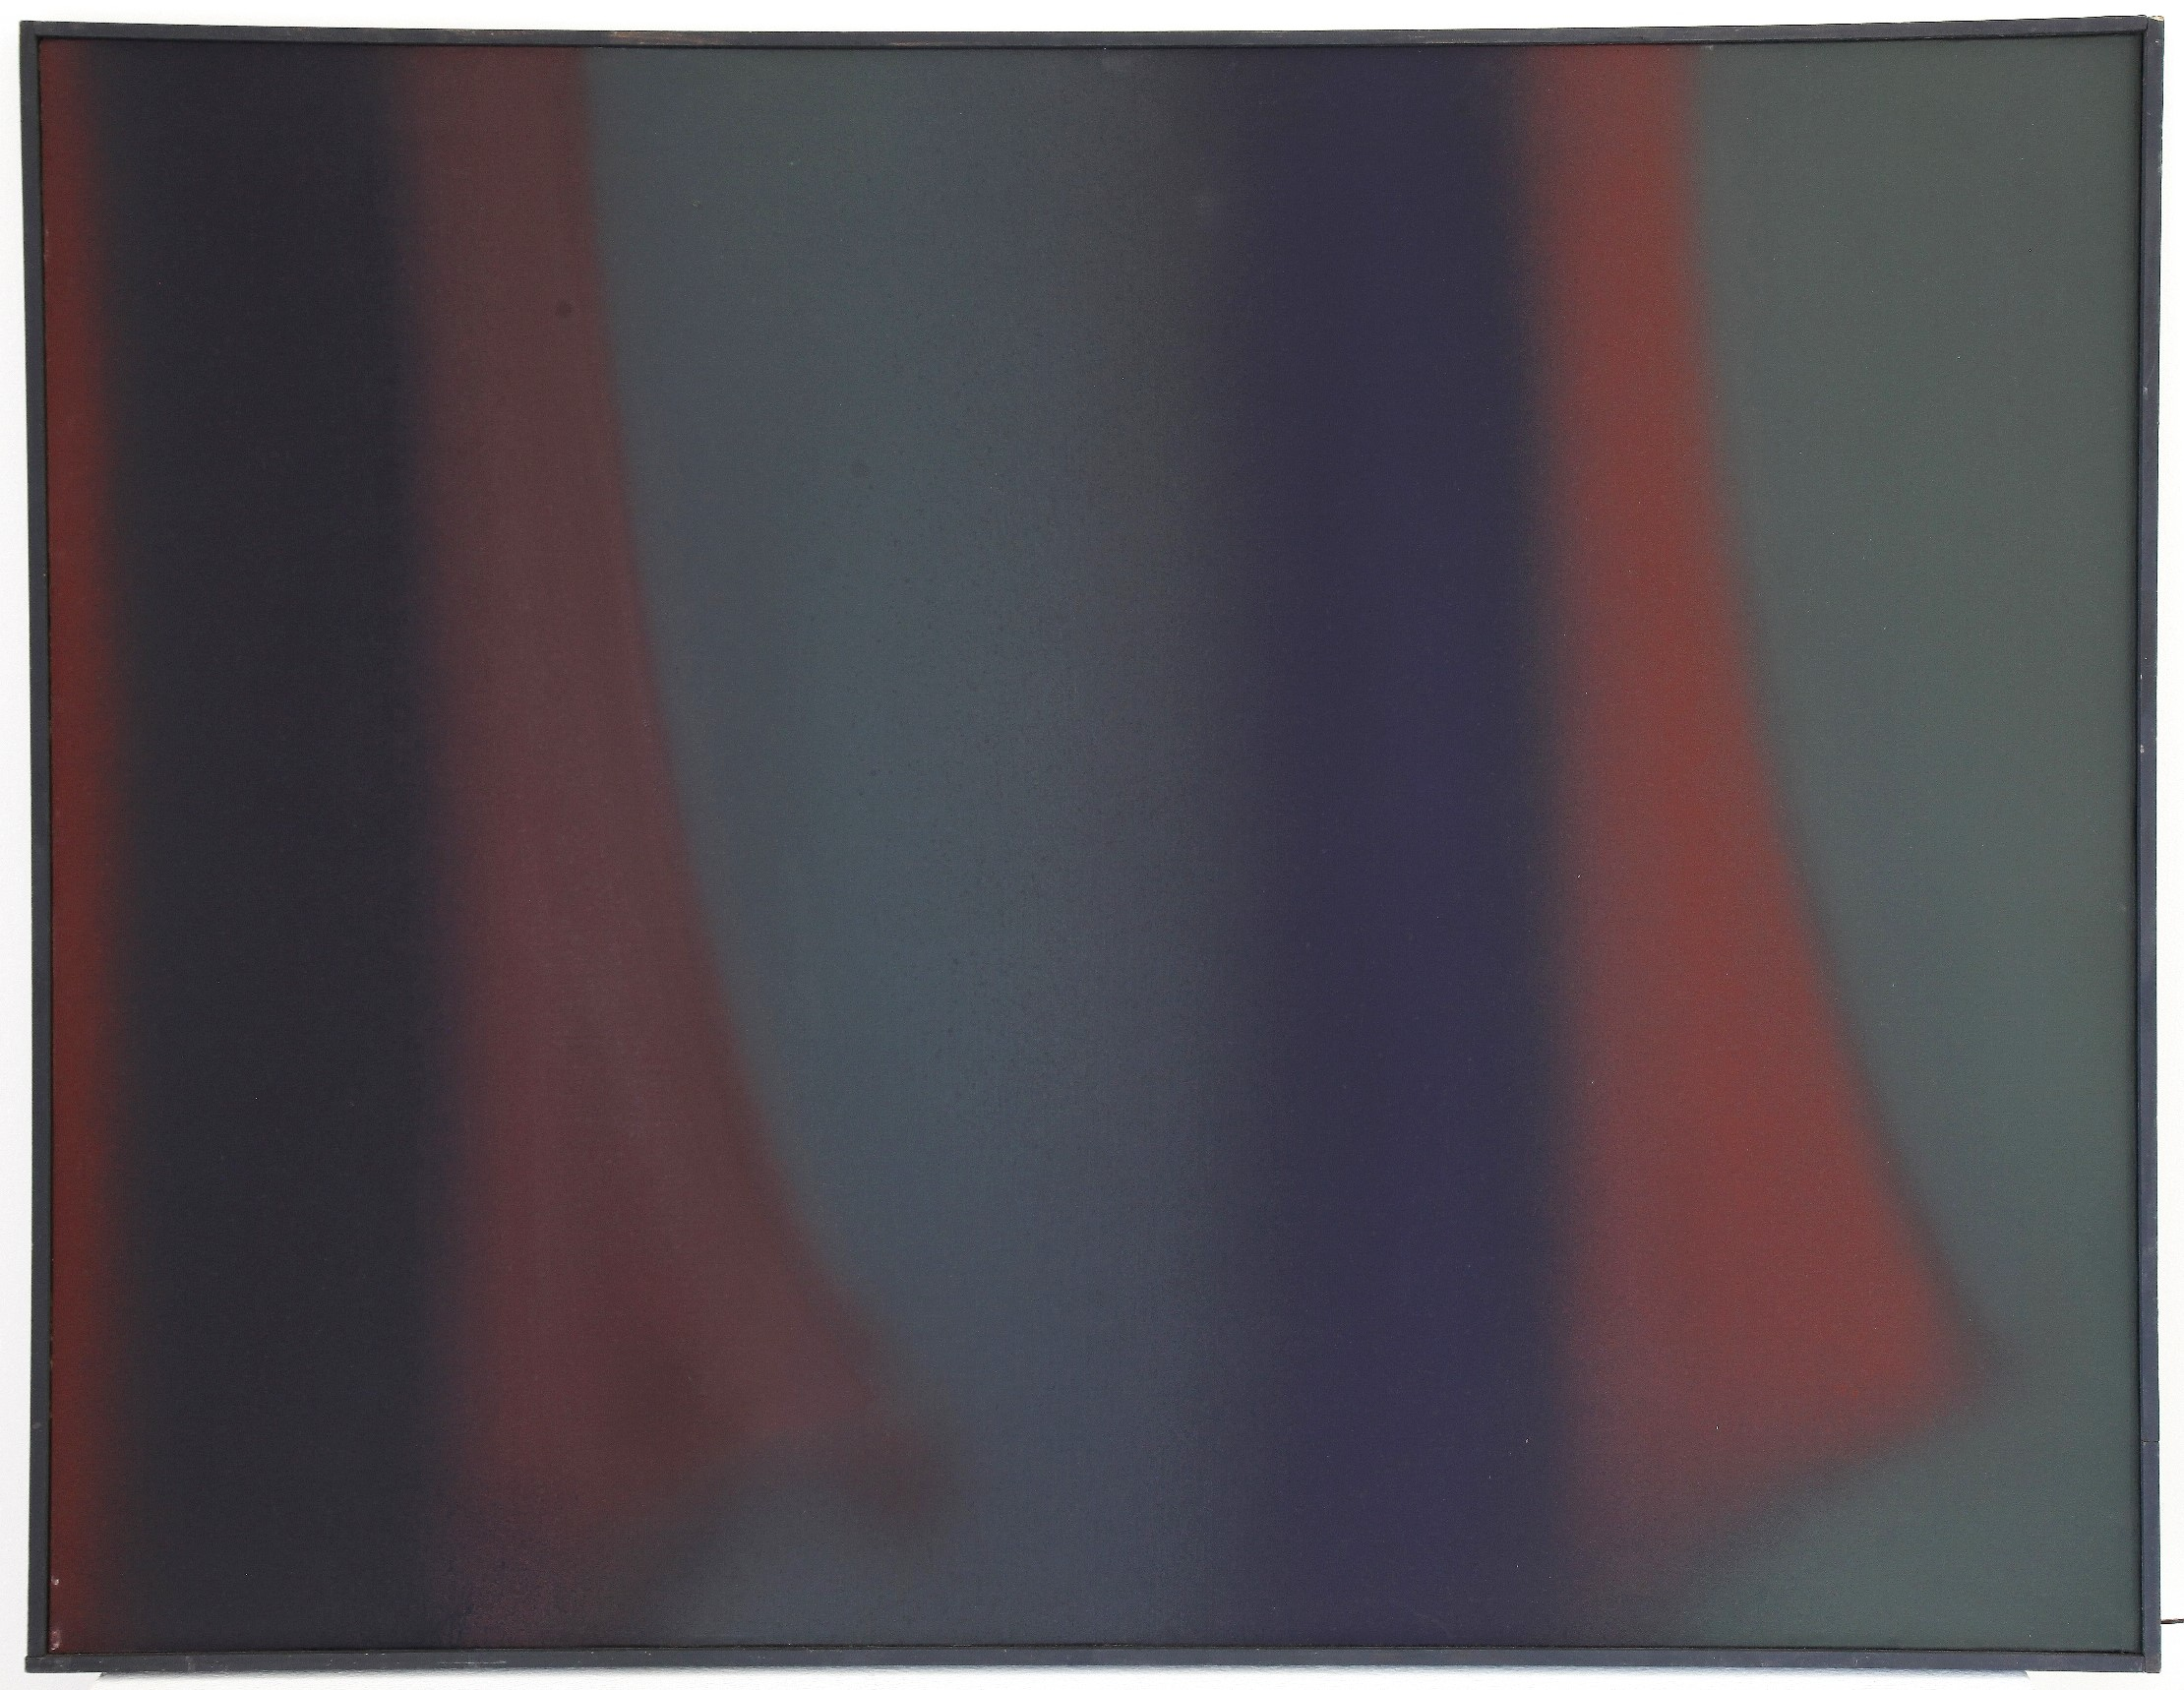 Claudio Olivieri senza titolo olio su tela 100x130 1978